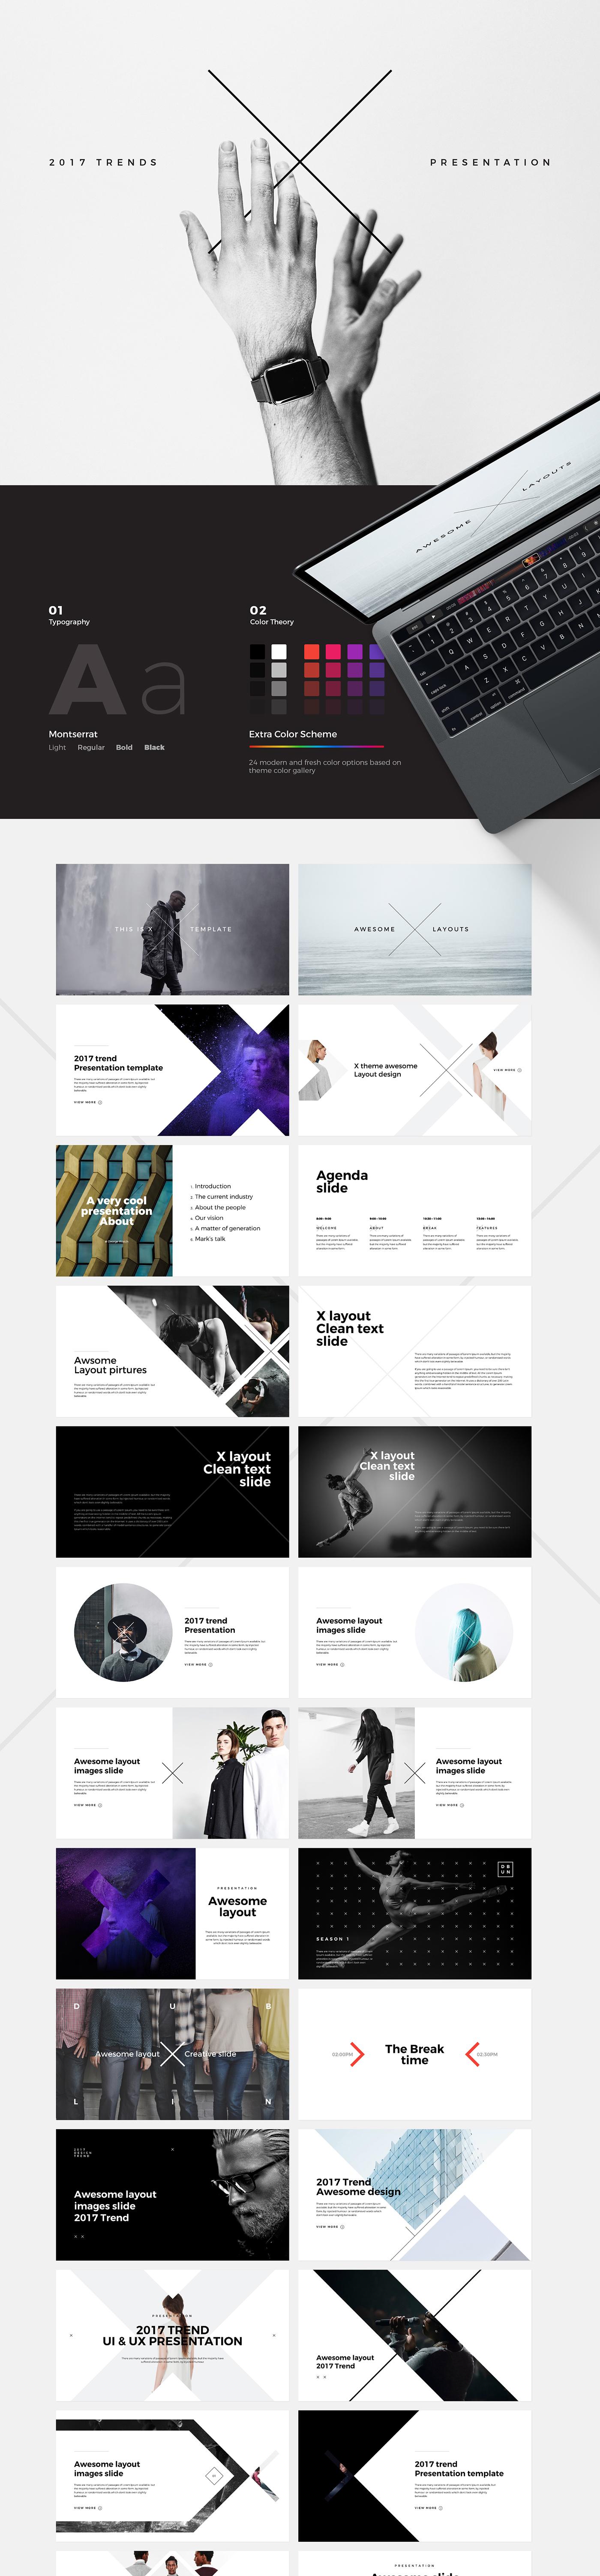 free,Free Template,free powerpoint,free keynote,Powerpoint,Keynote,presentation,minimal